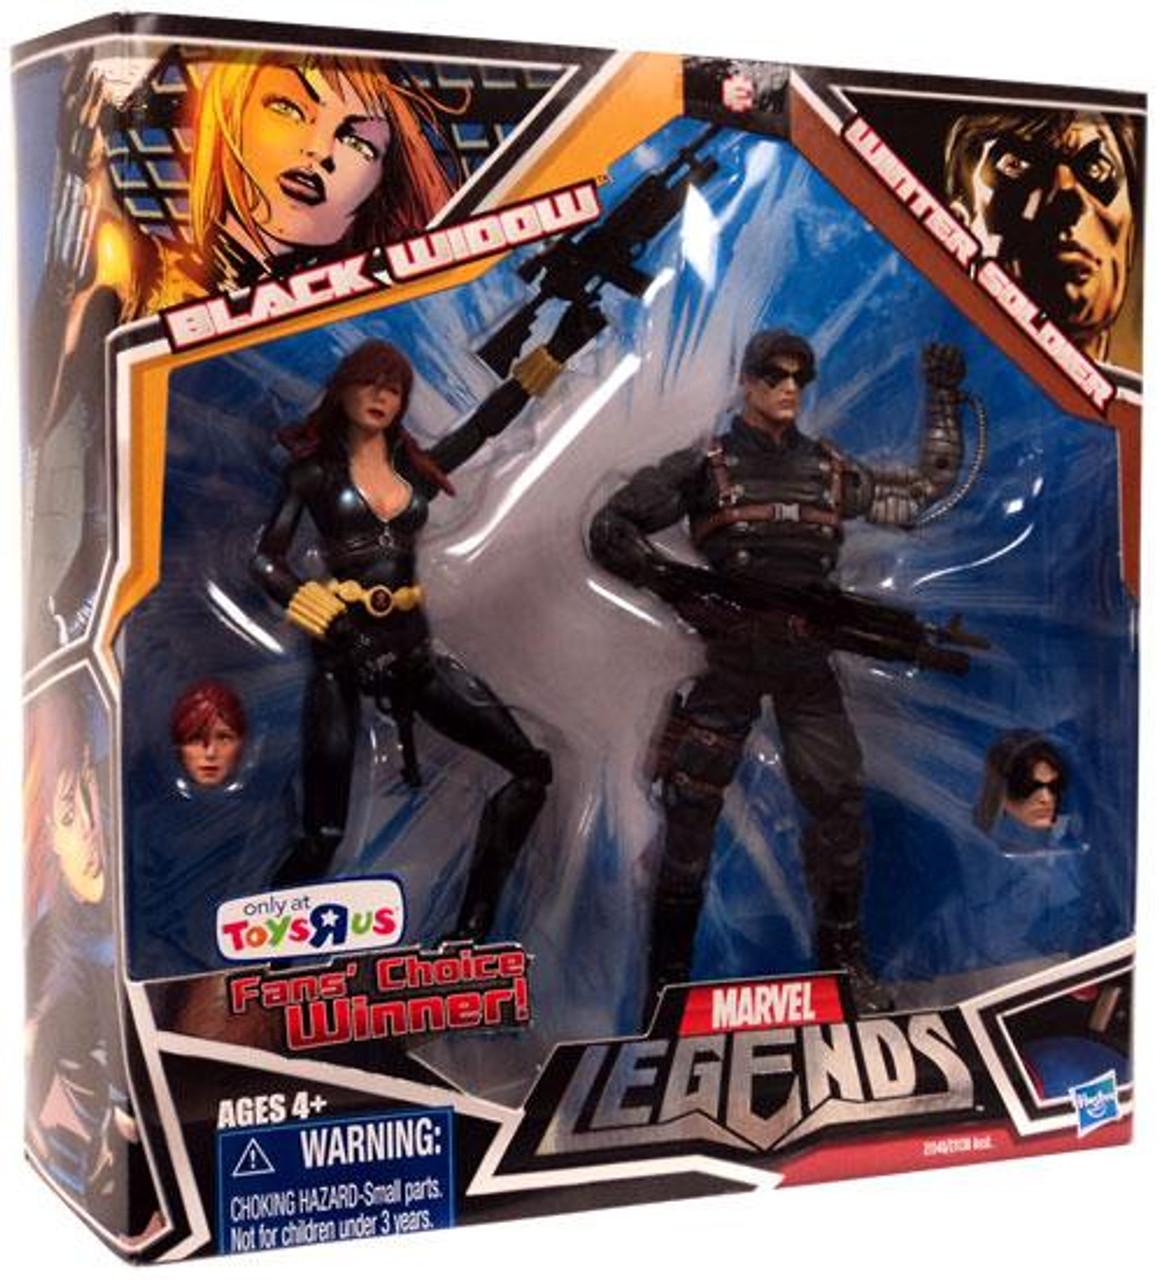 Marvel Legends Fan's Choice Black Widow & Winter Soldier Action Figure 2-Pack [Black Costume]